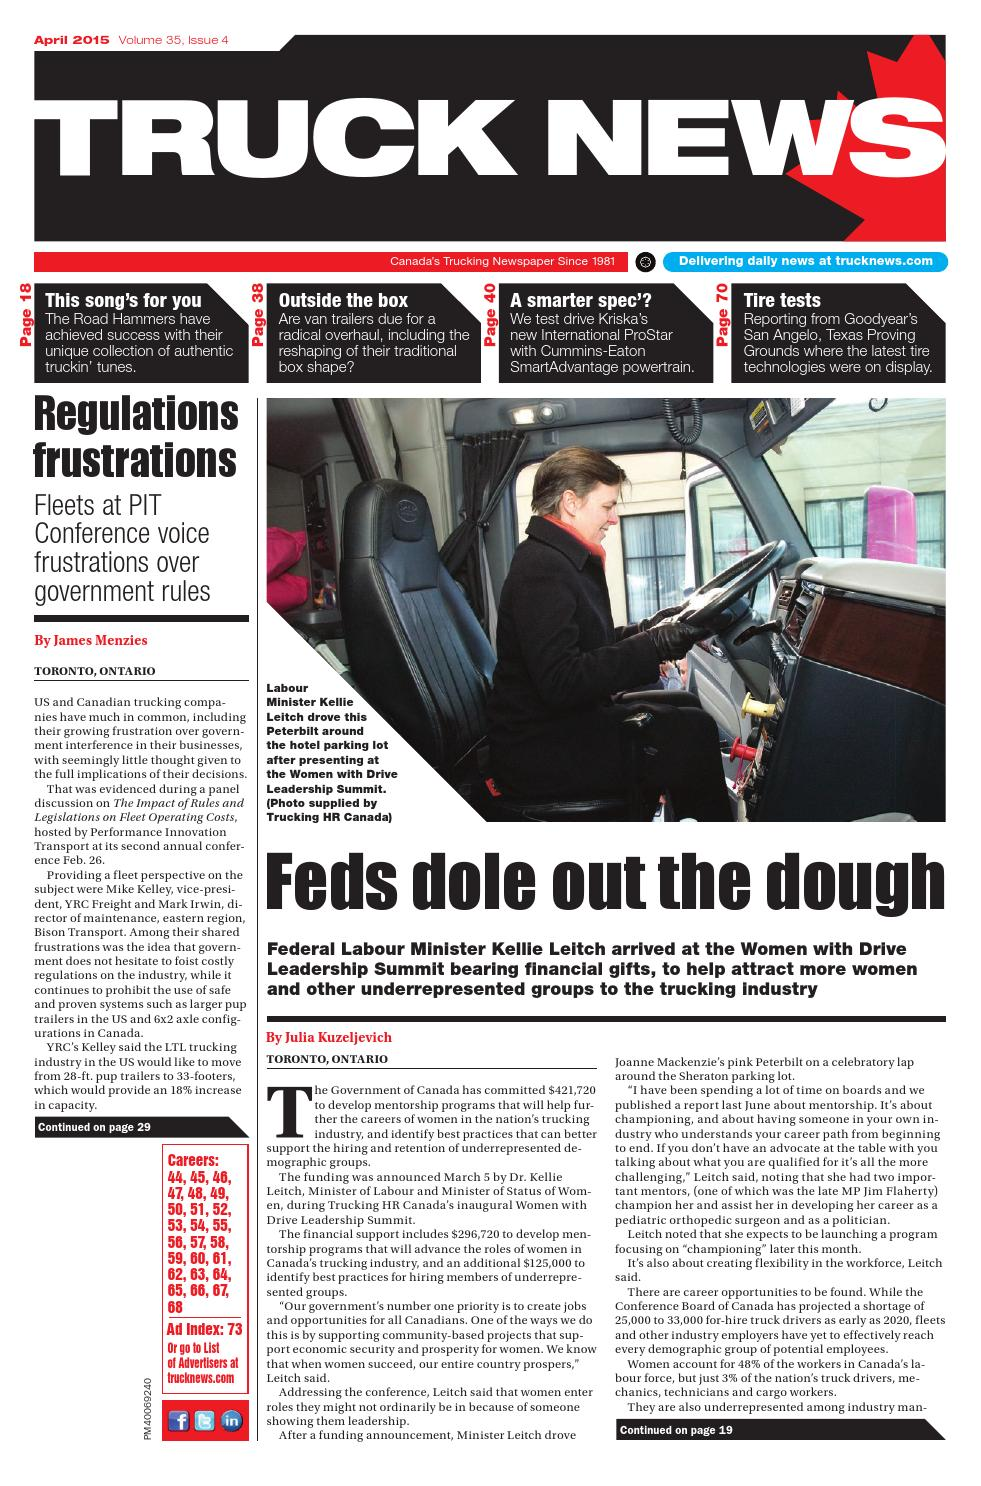 Truck News April 2015 by Annex Business Media - issuu